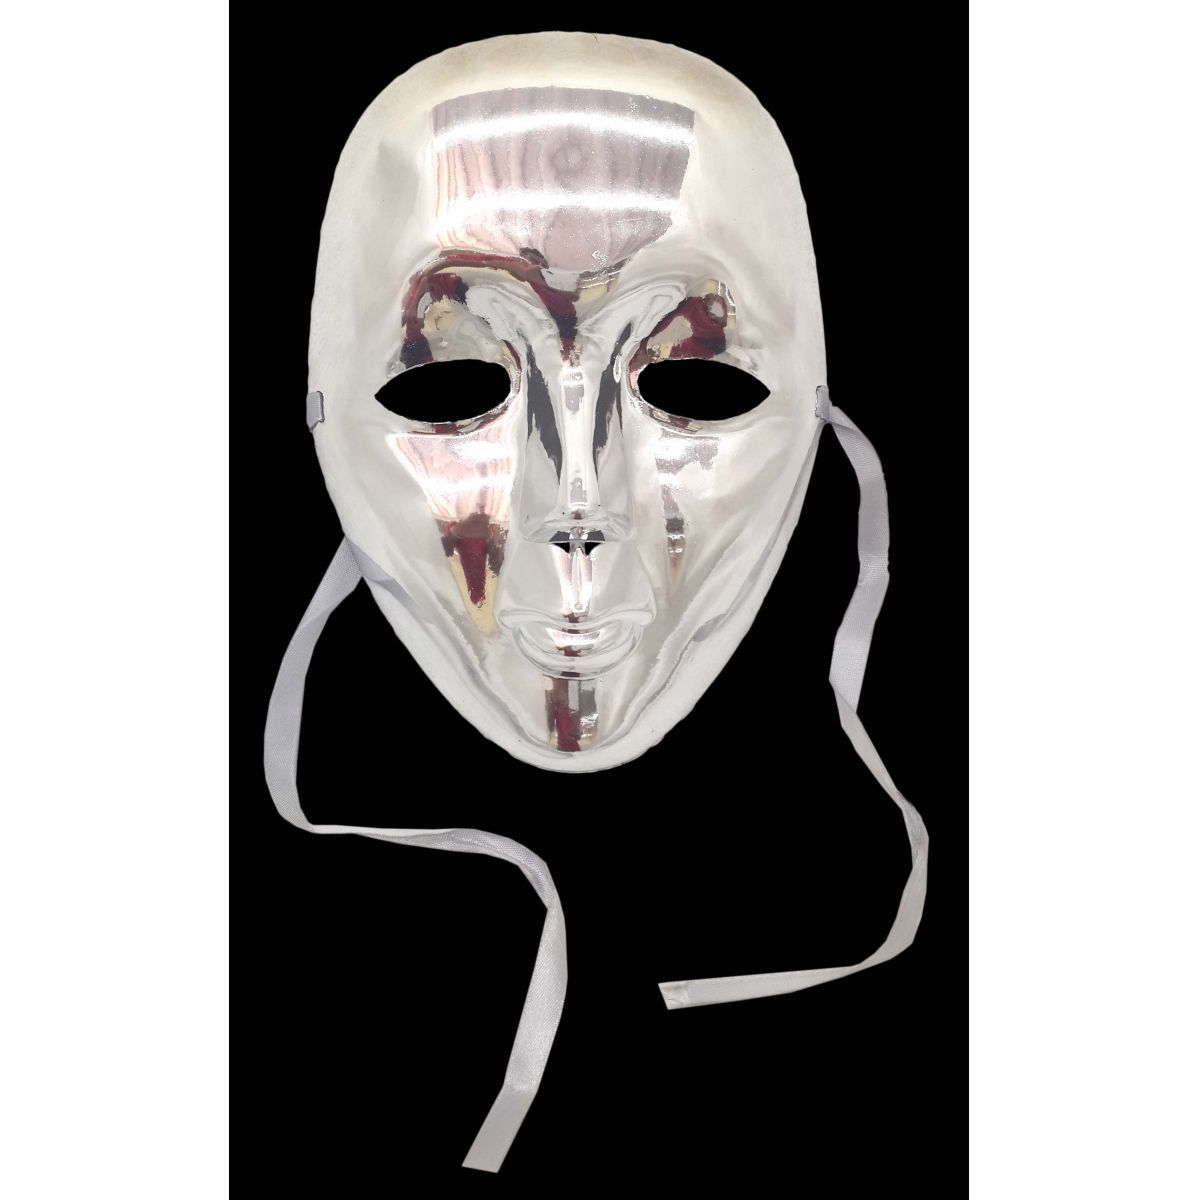 Conjunto 12 Mascaras Para Festa Baile Carnaval Halloween Fantasia Metalizada Prata (BL-0258-4)